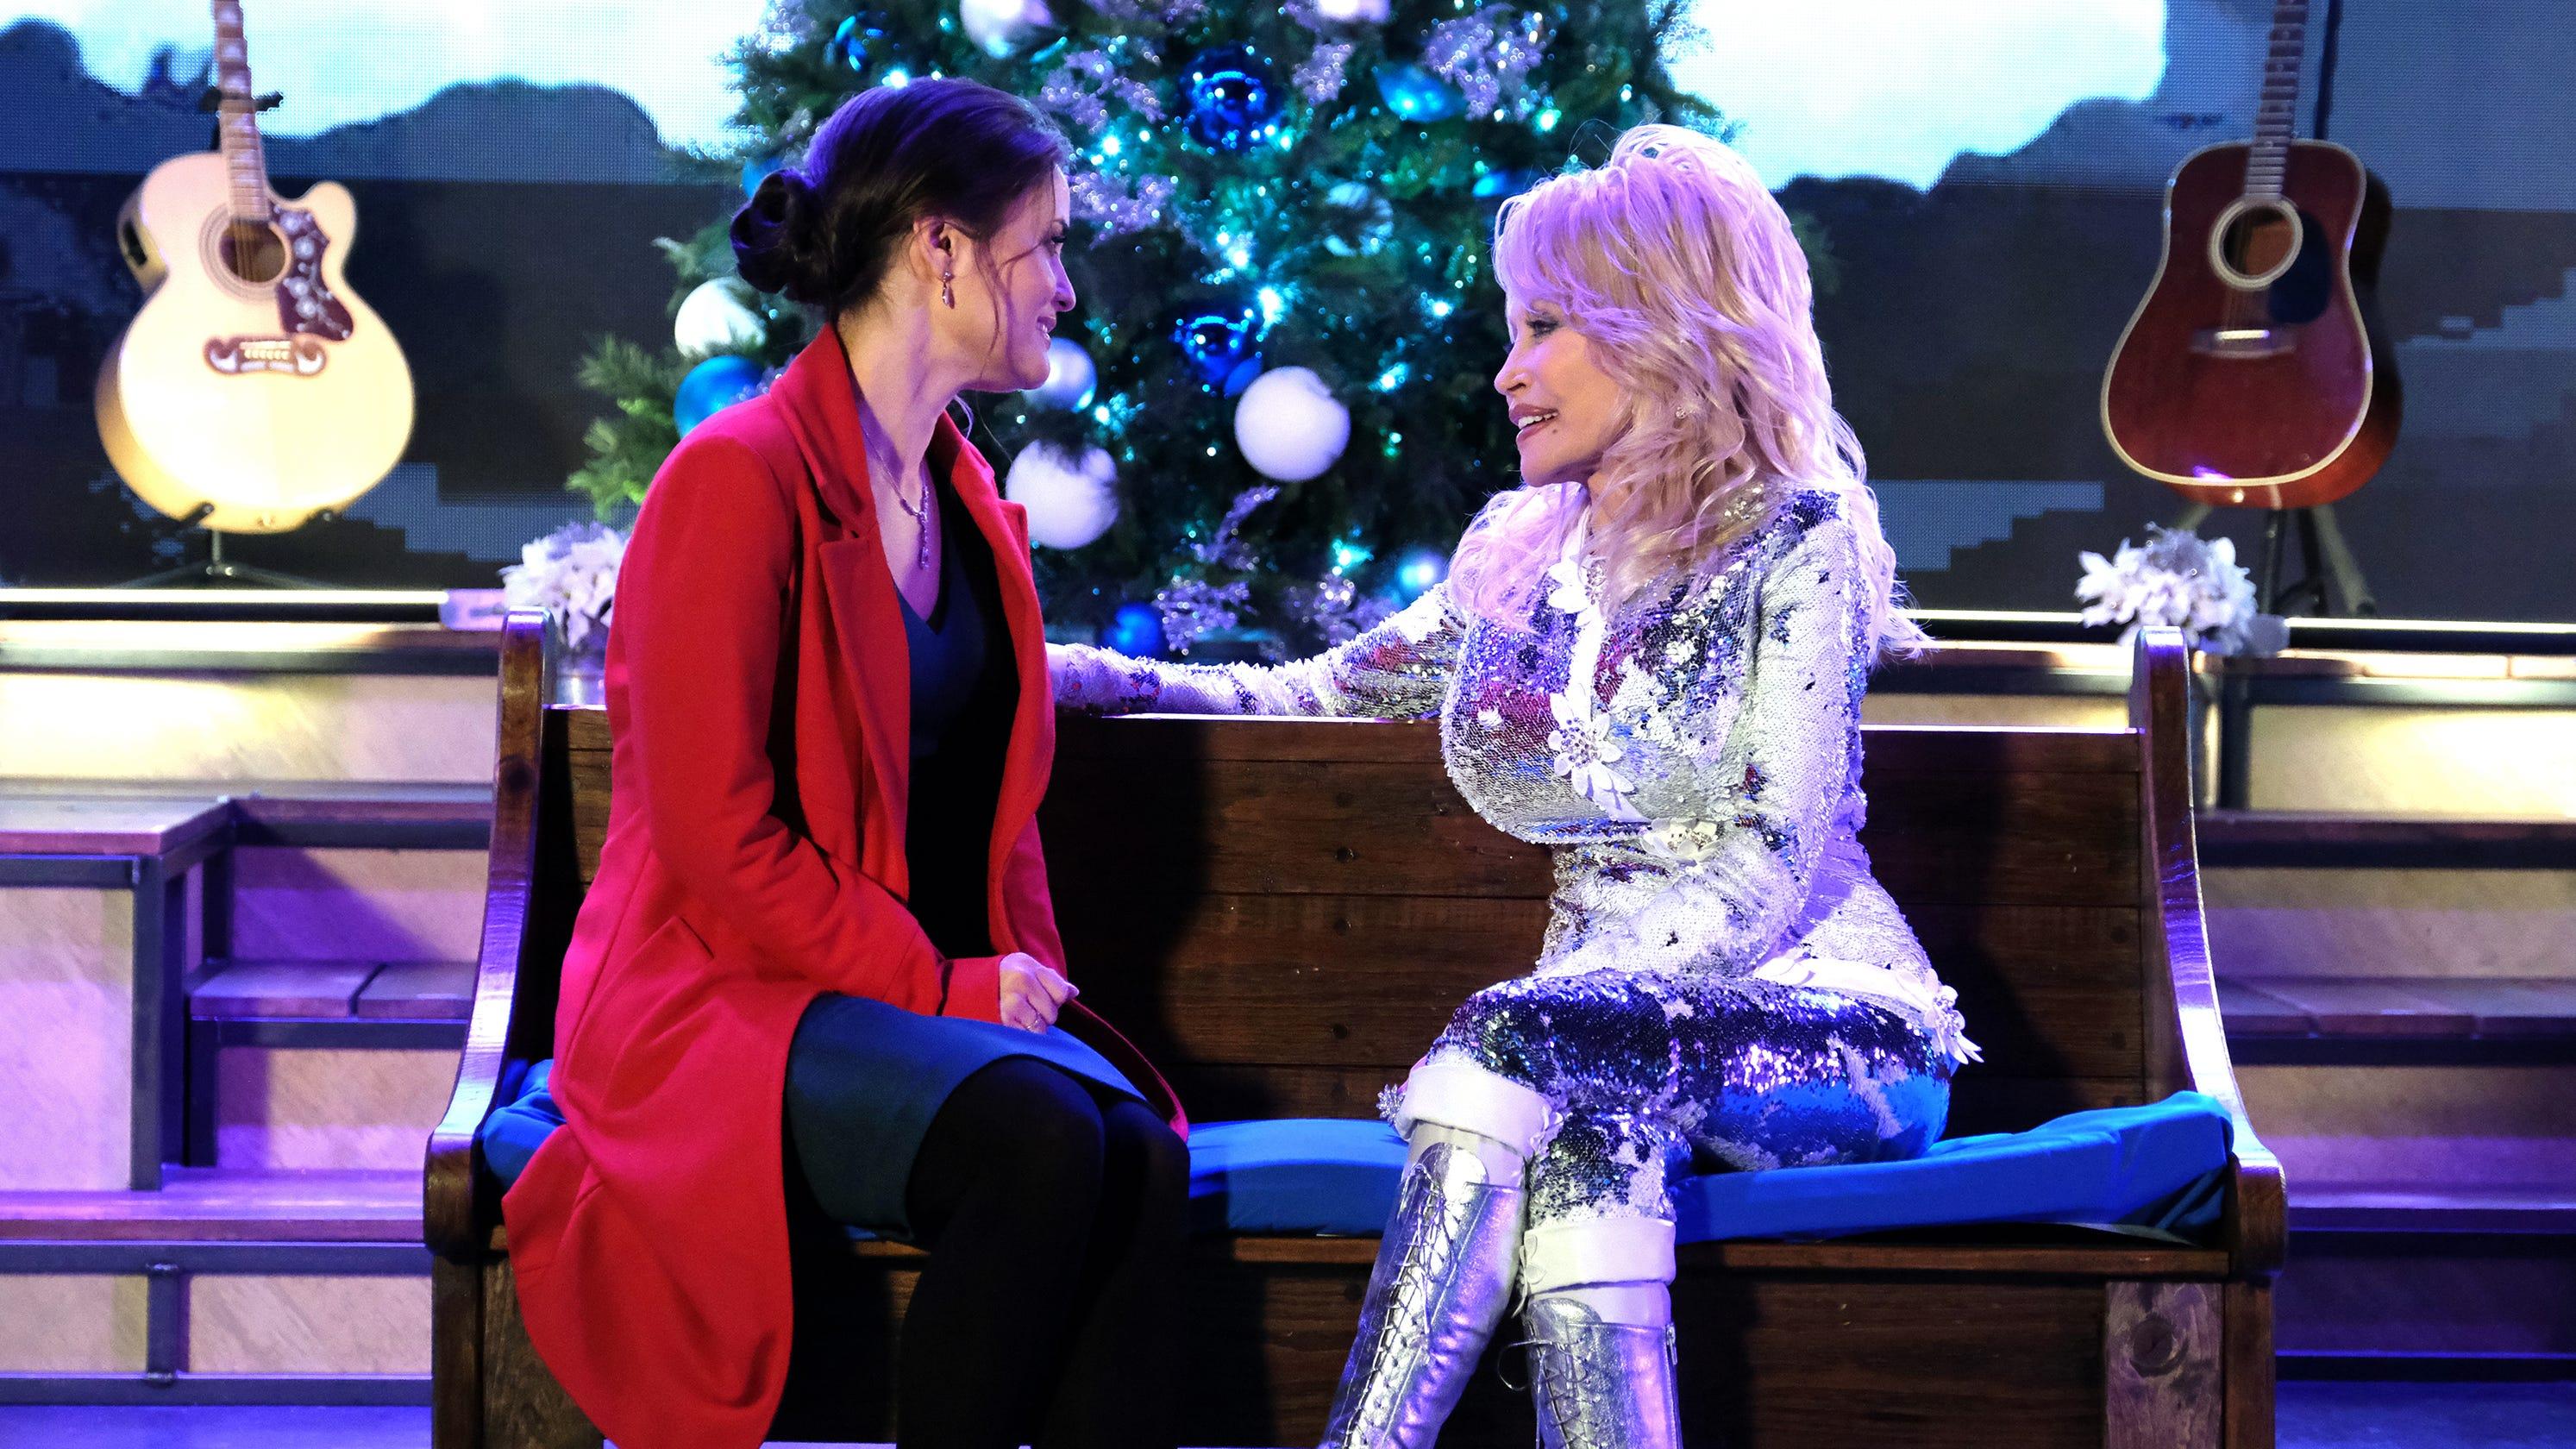 Christmas at Dollywood:' 5 things to